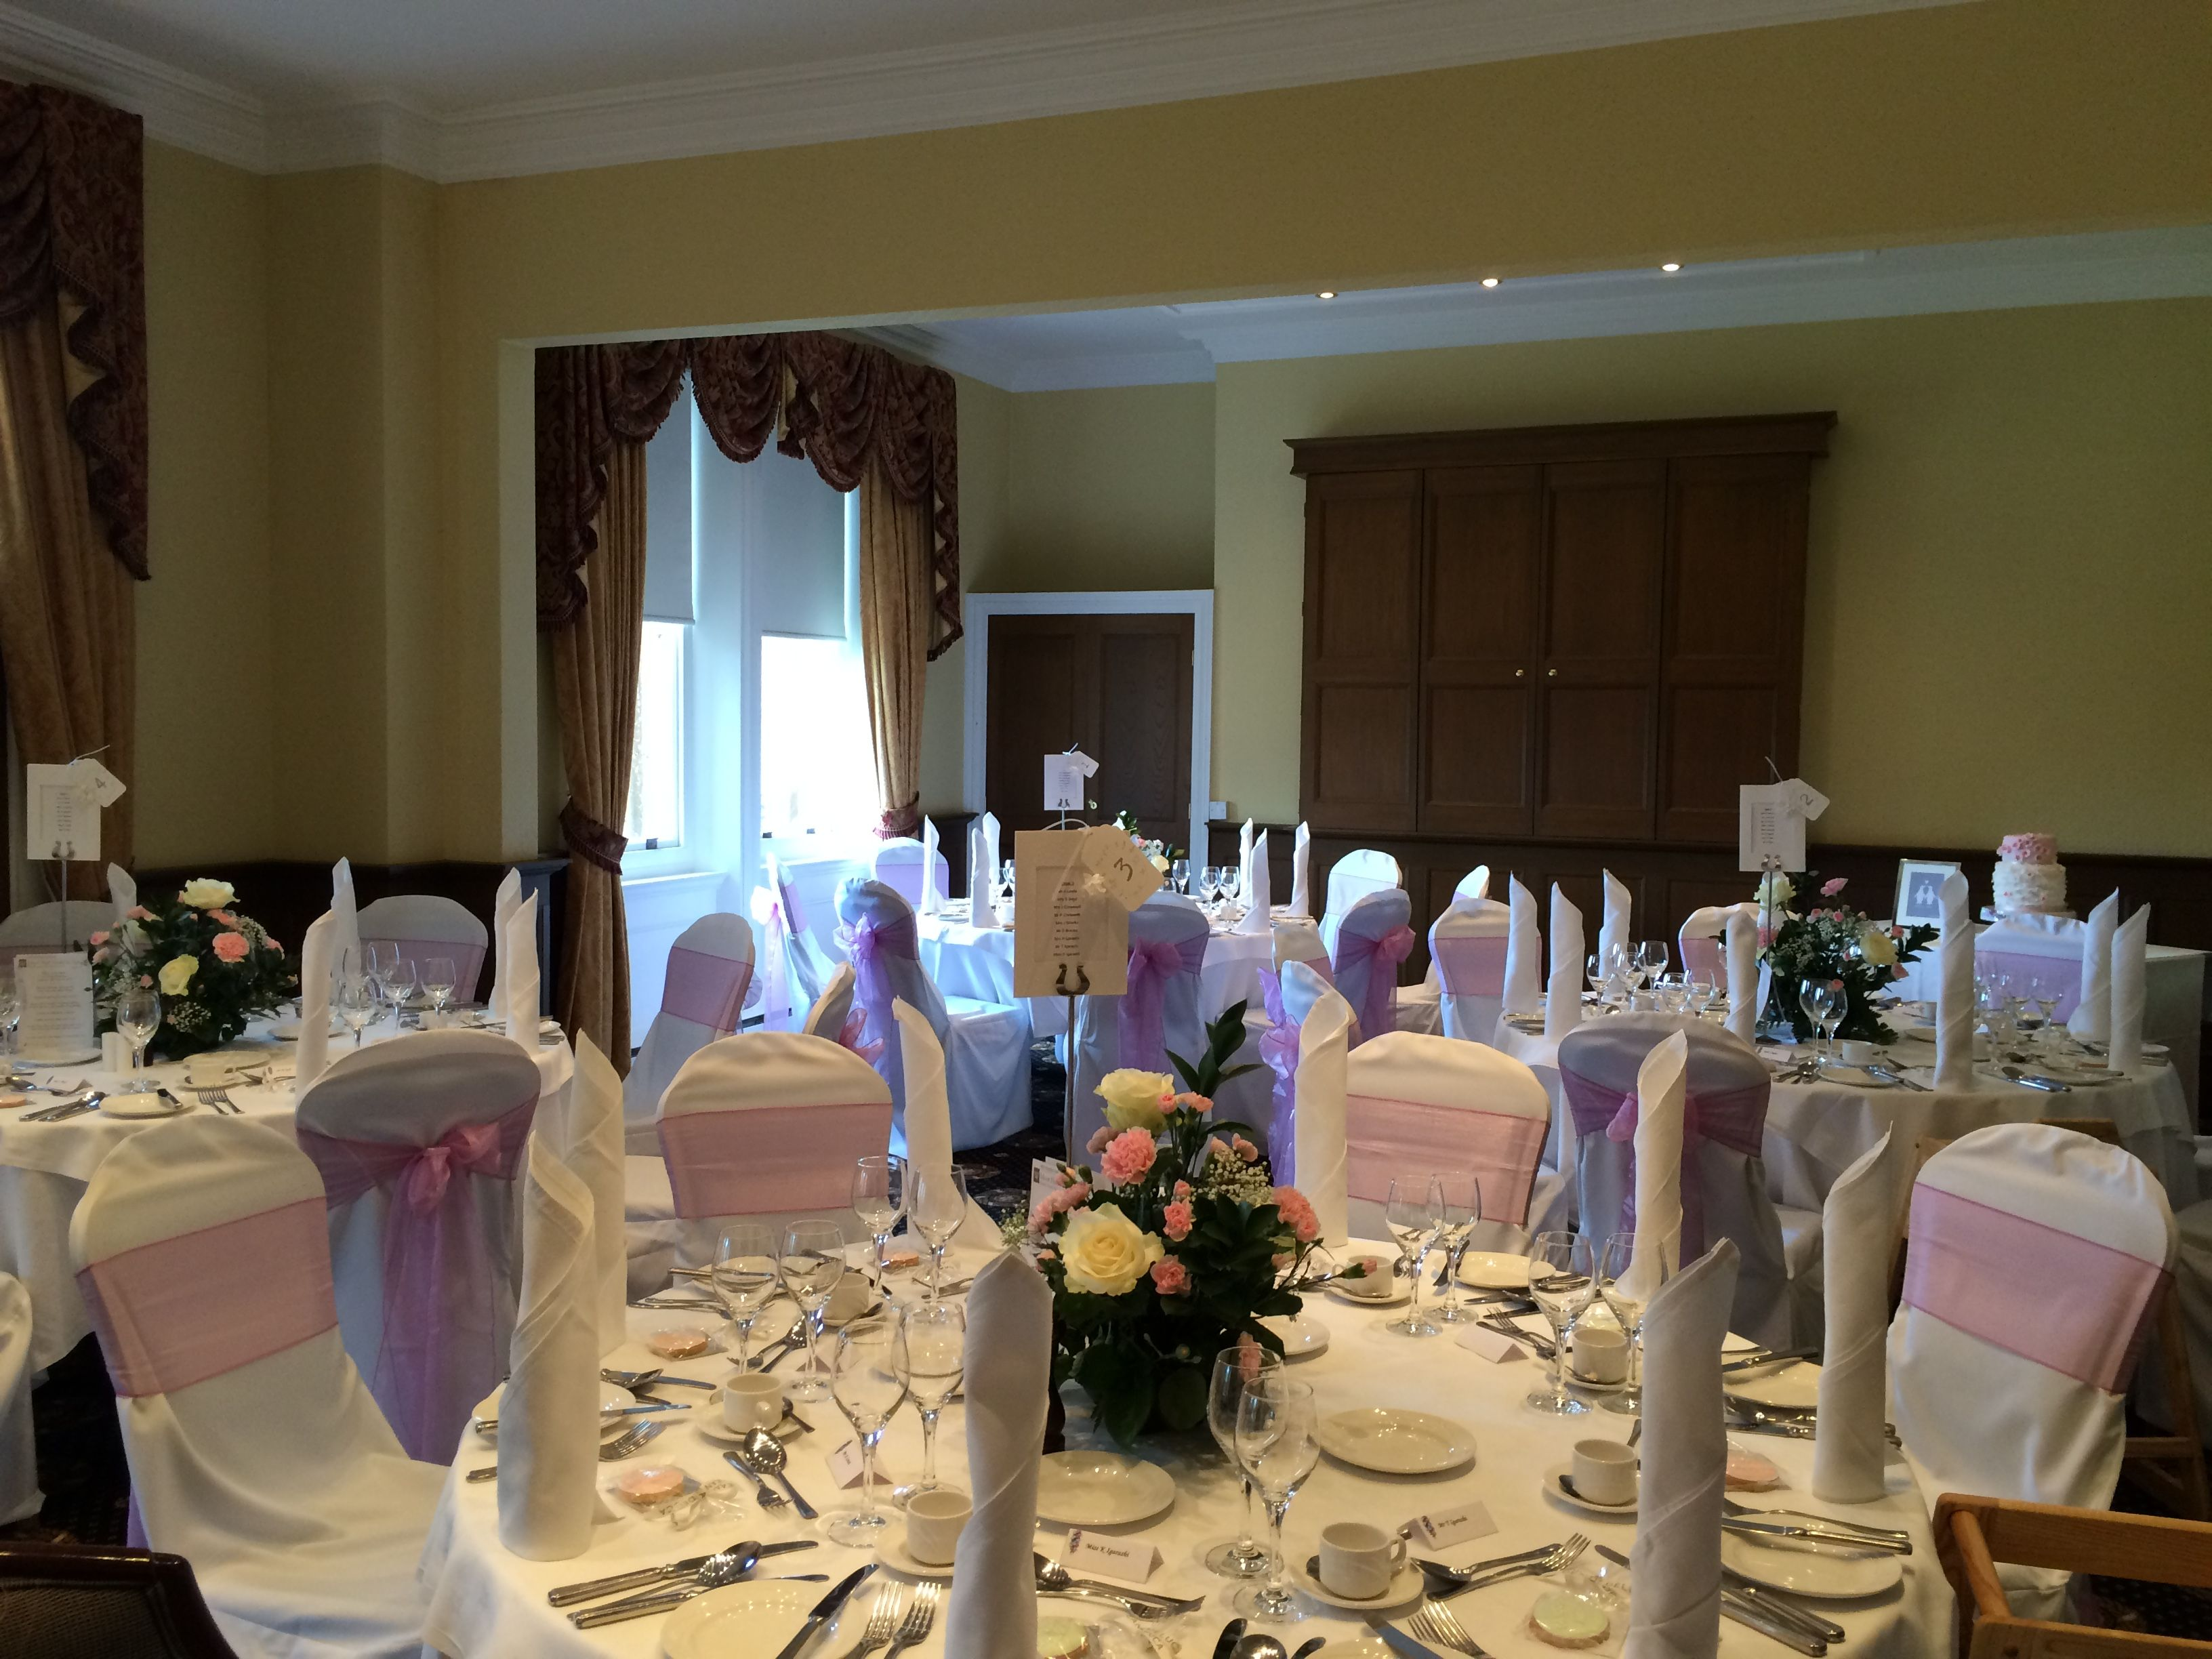 Wedding Breakfast Bracebridge Room At Moor Hall Hotel Spa Venues In Sutton Coldfield